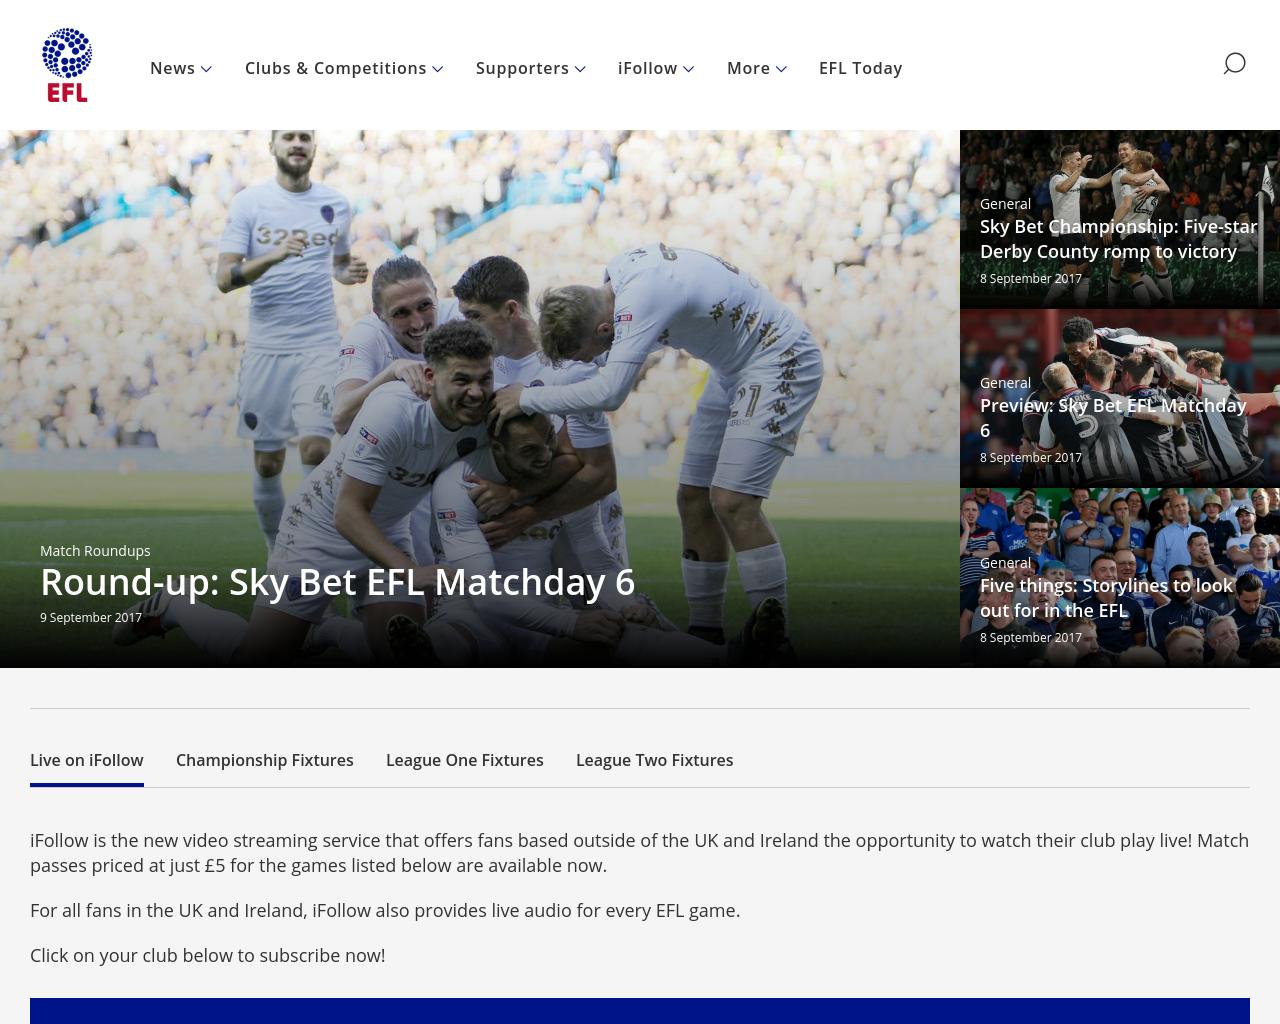 EFL-(English-Football-League)-Advertising-Reviews-Pricing